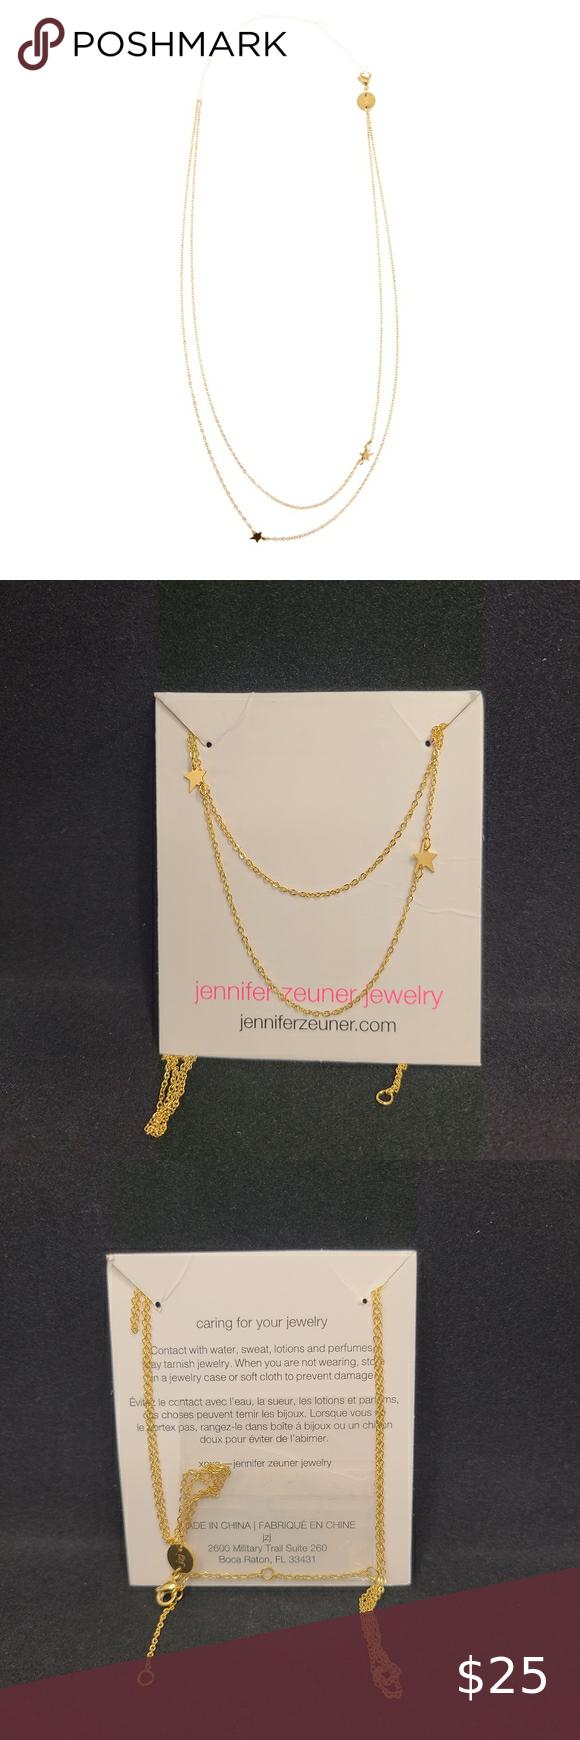 32+ Jennifer zeuner jewelry star necklace information